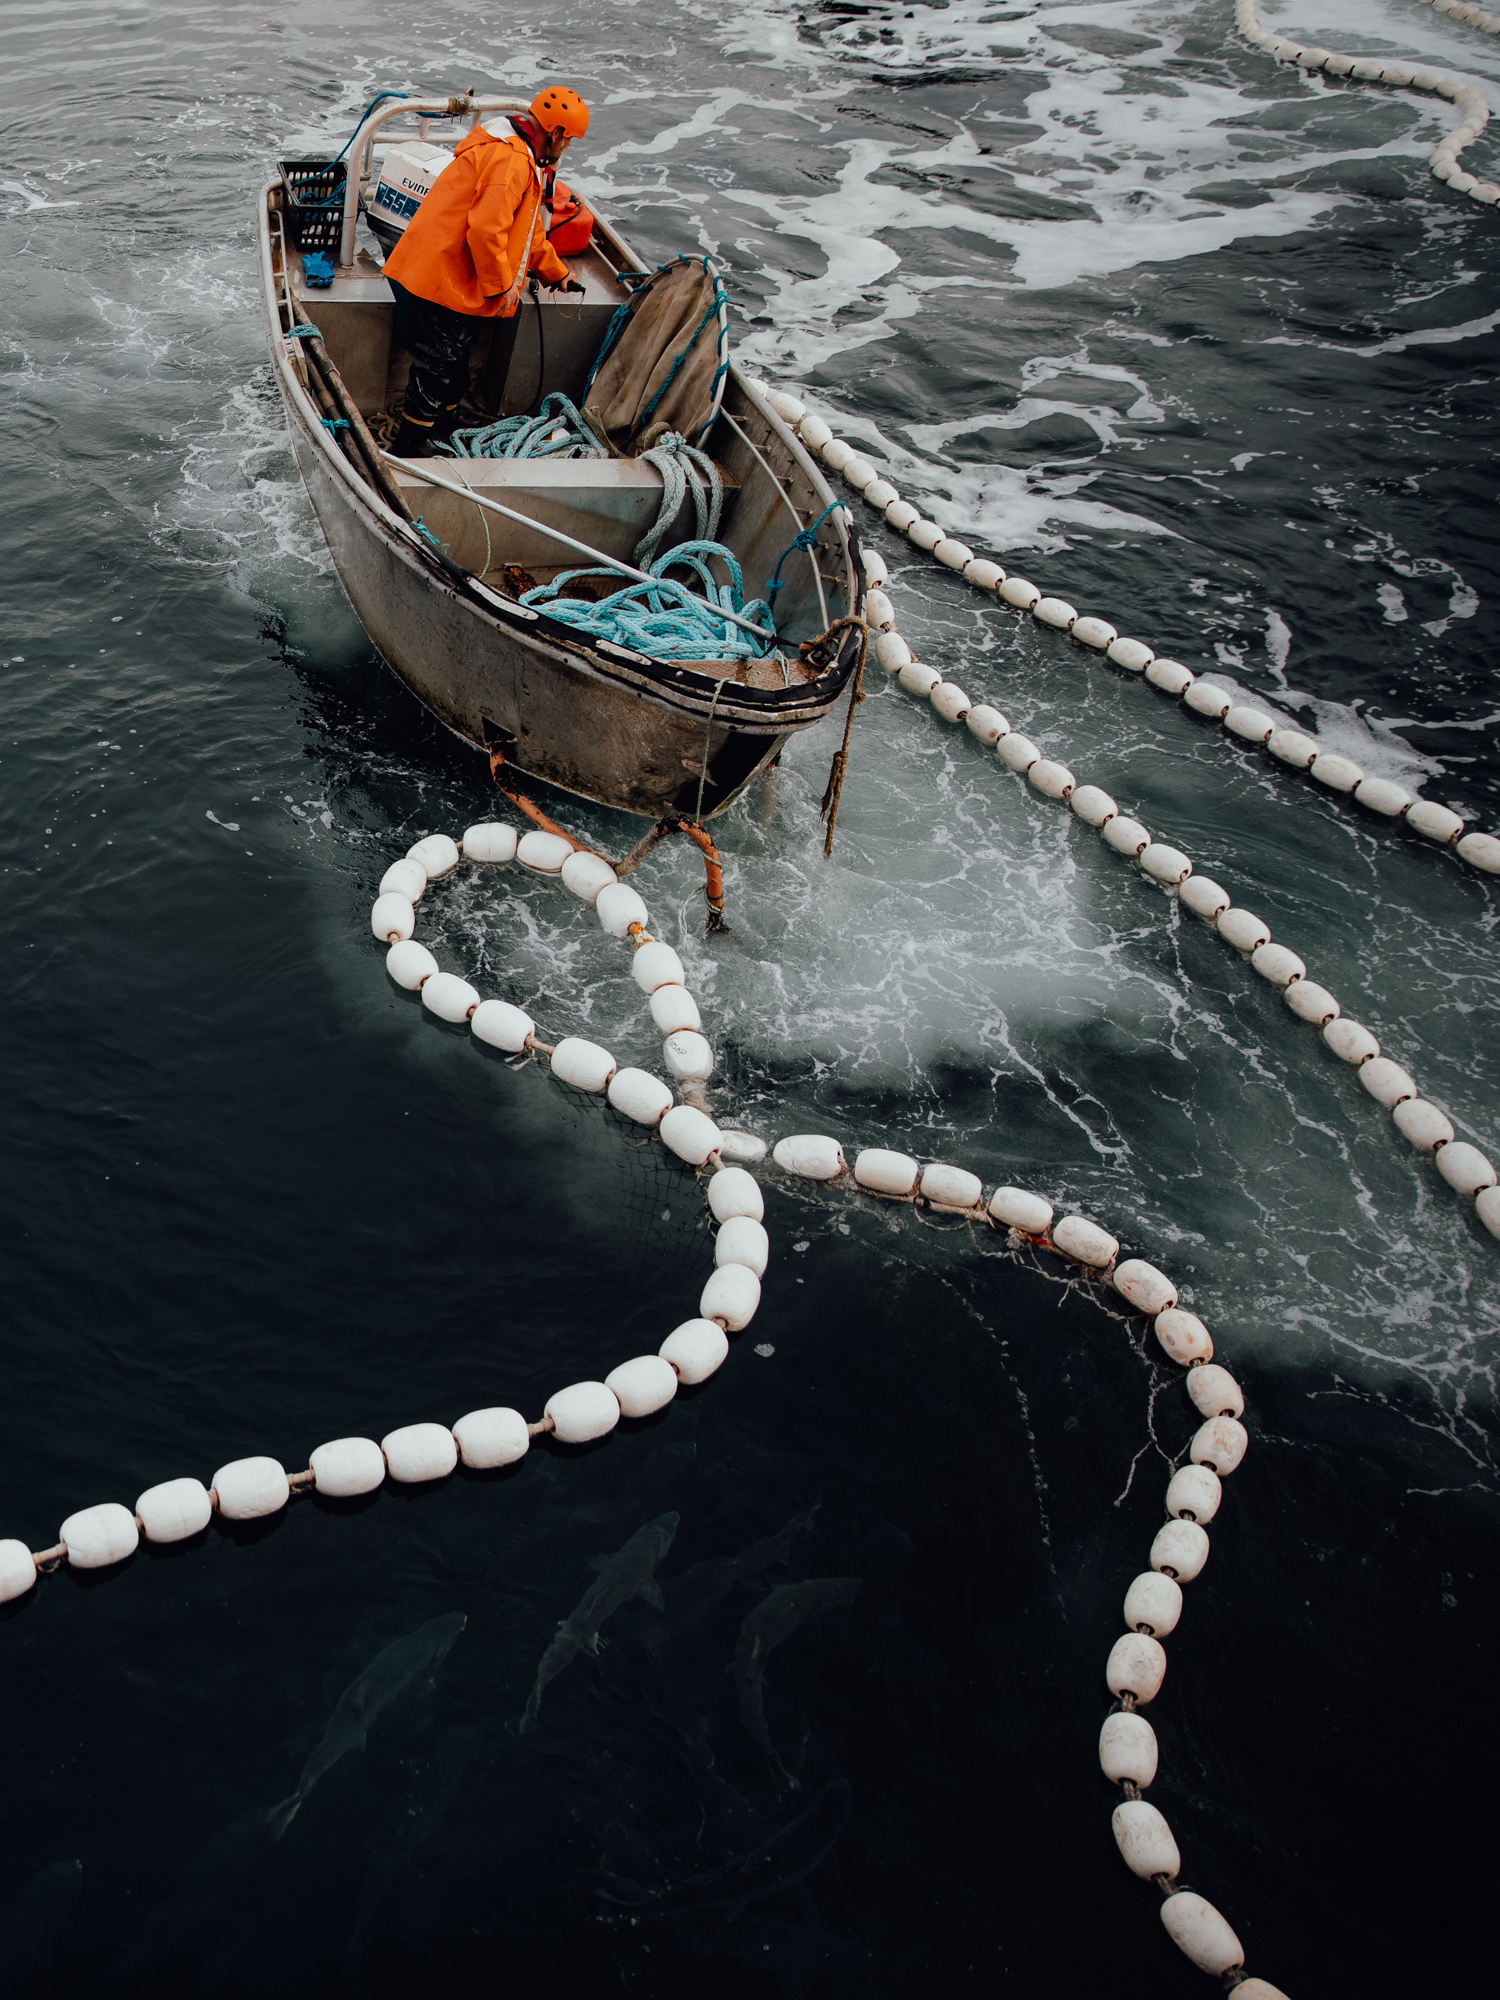 Marine Stewardship Council • Sustainable Fisheries